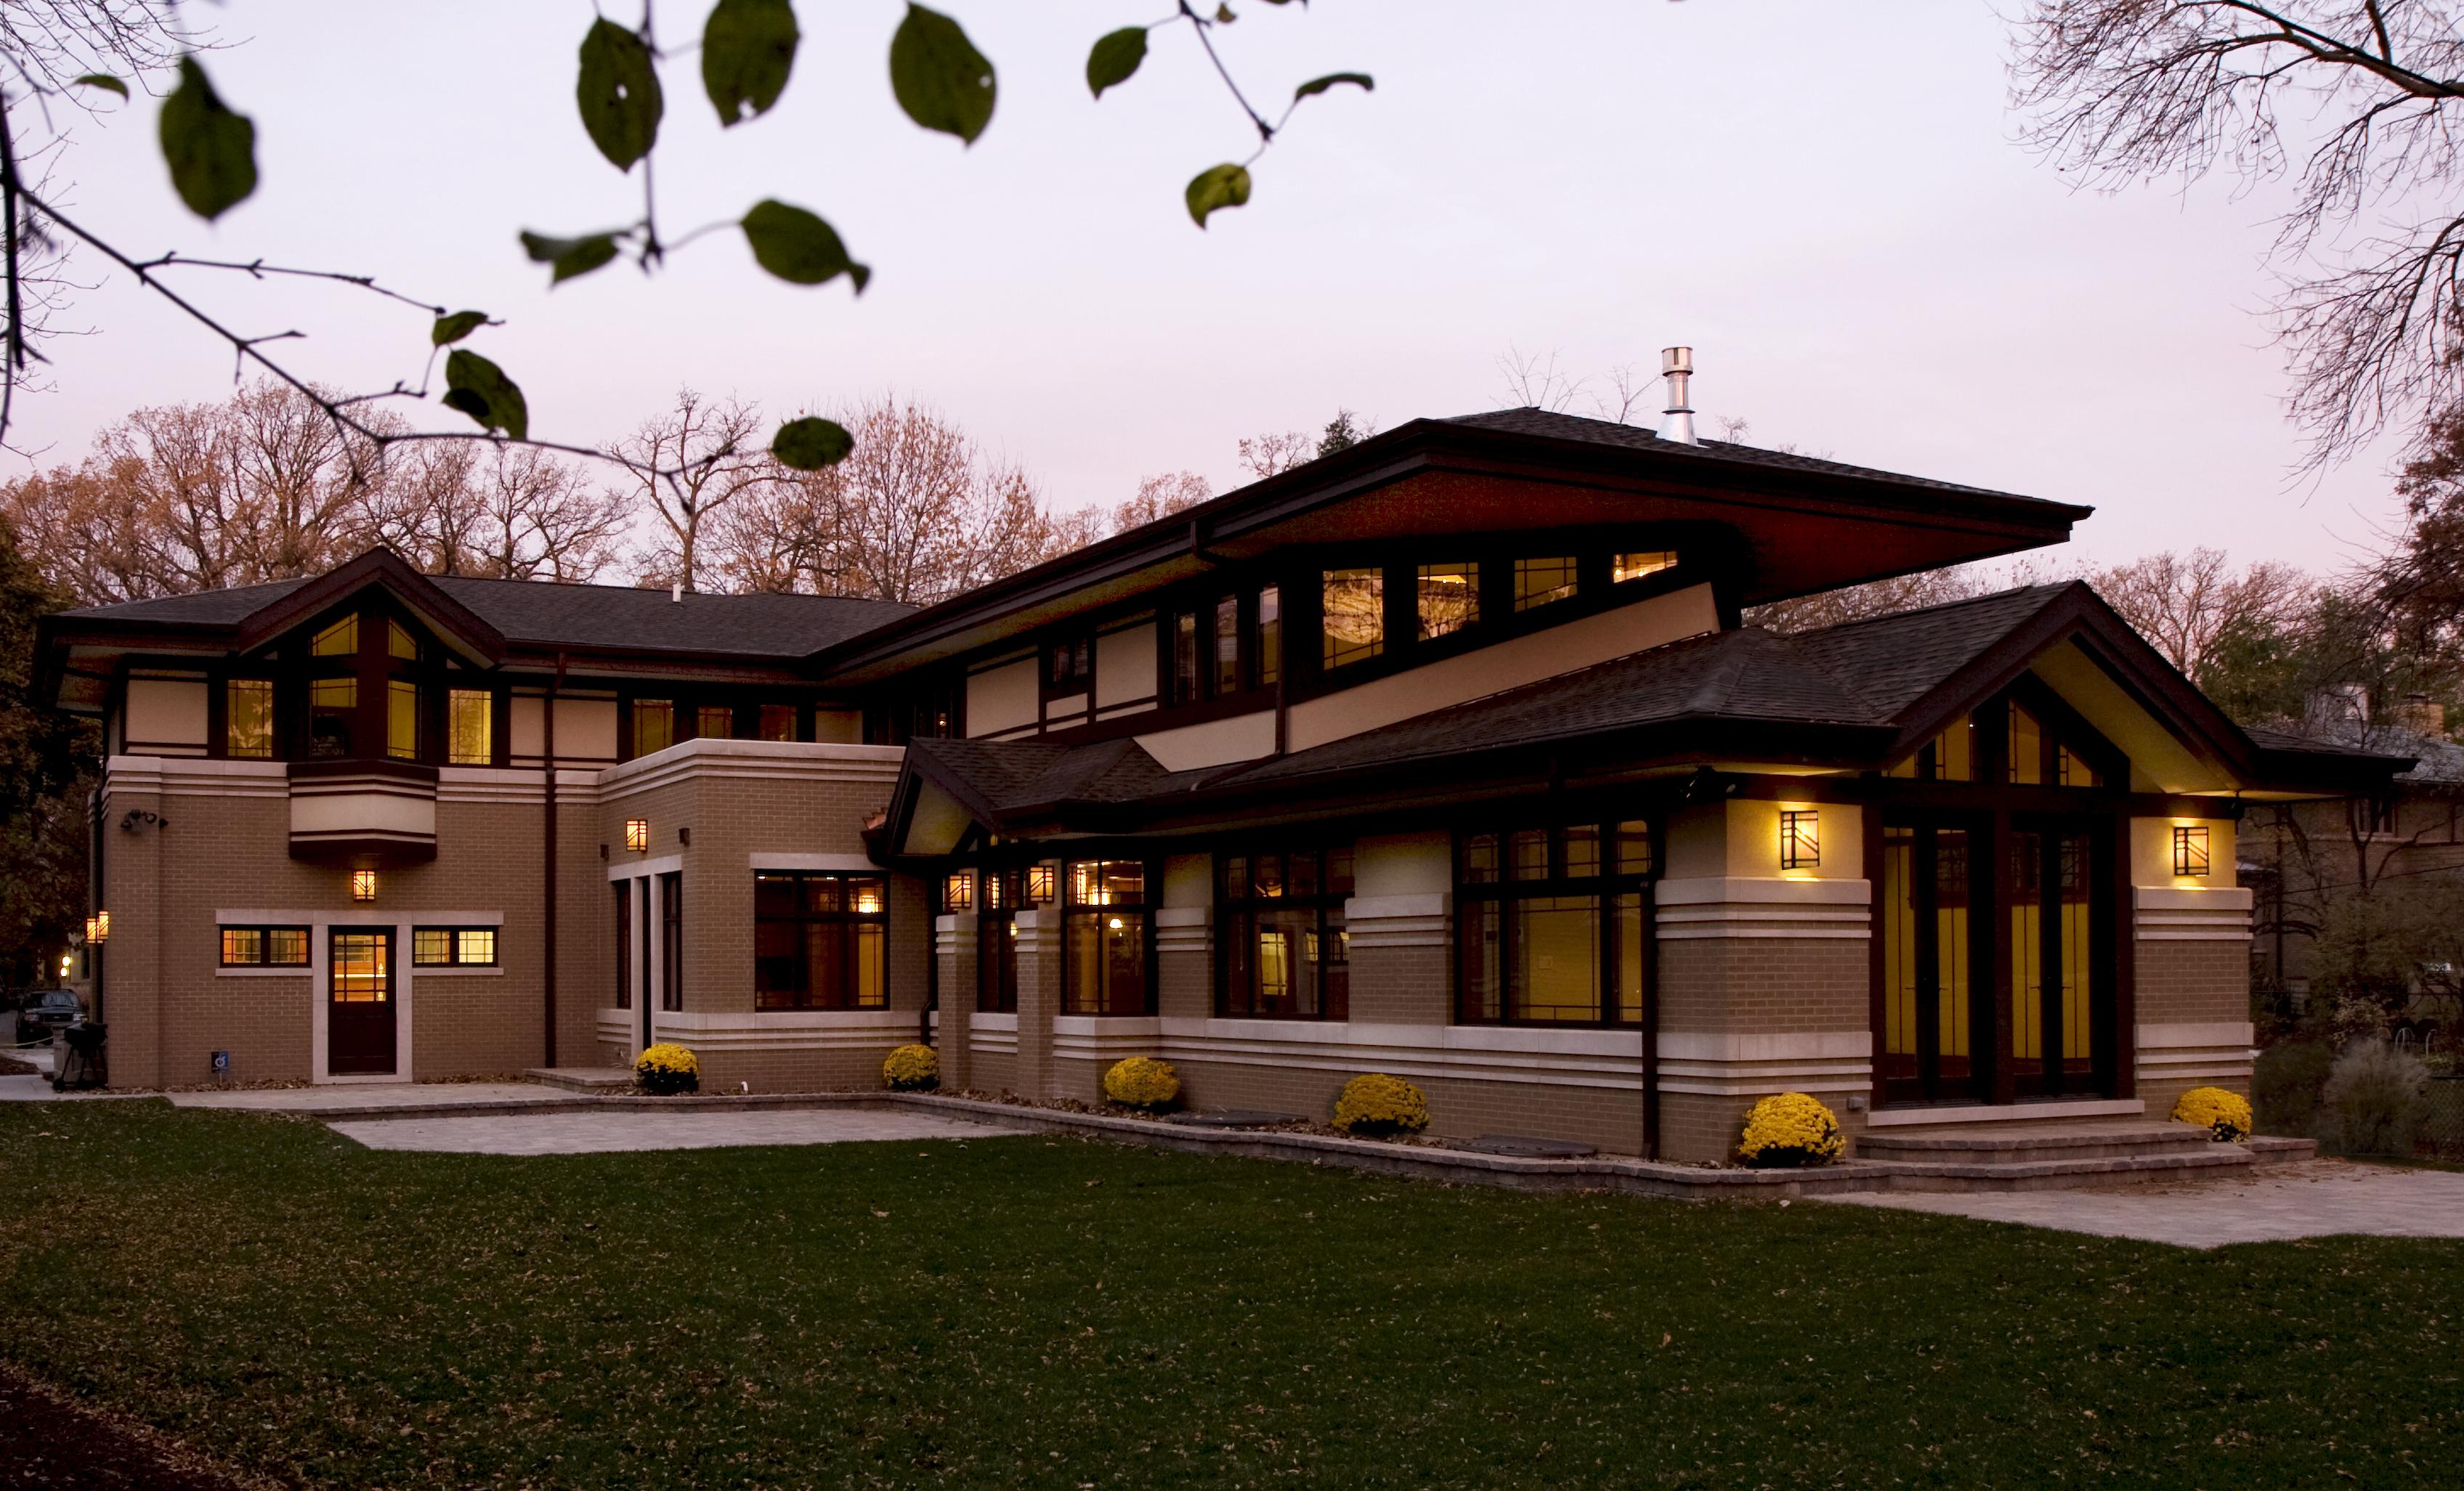 frank lloyd wright home designs - home design ideas